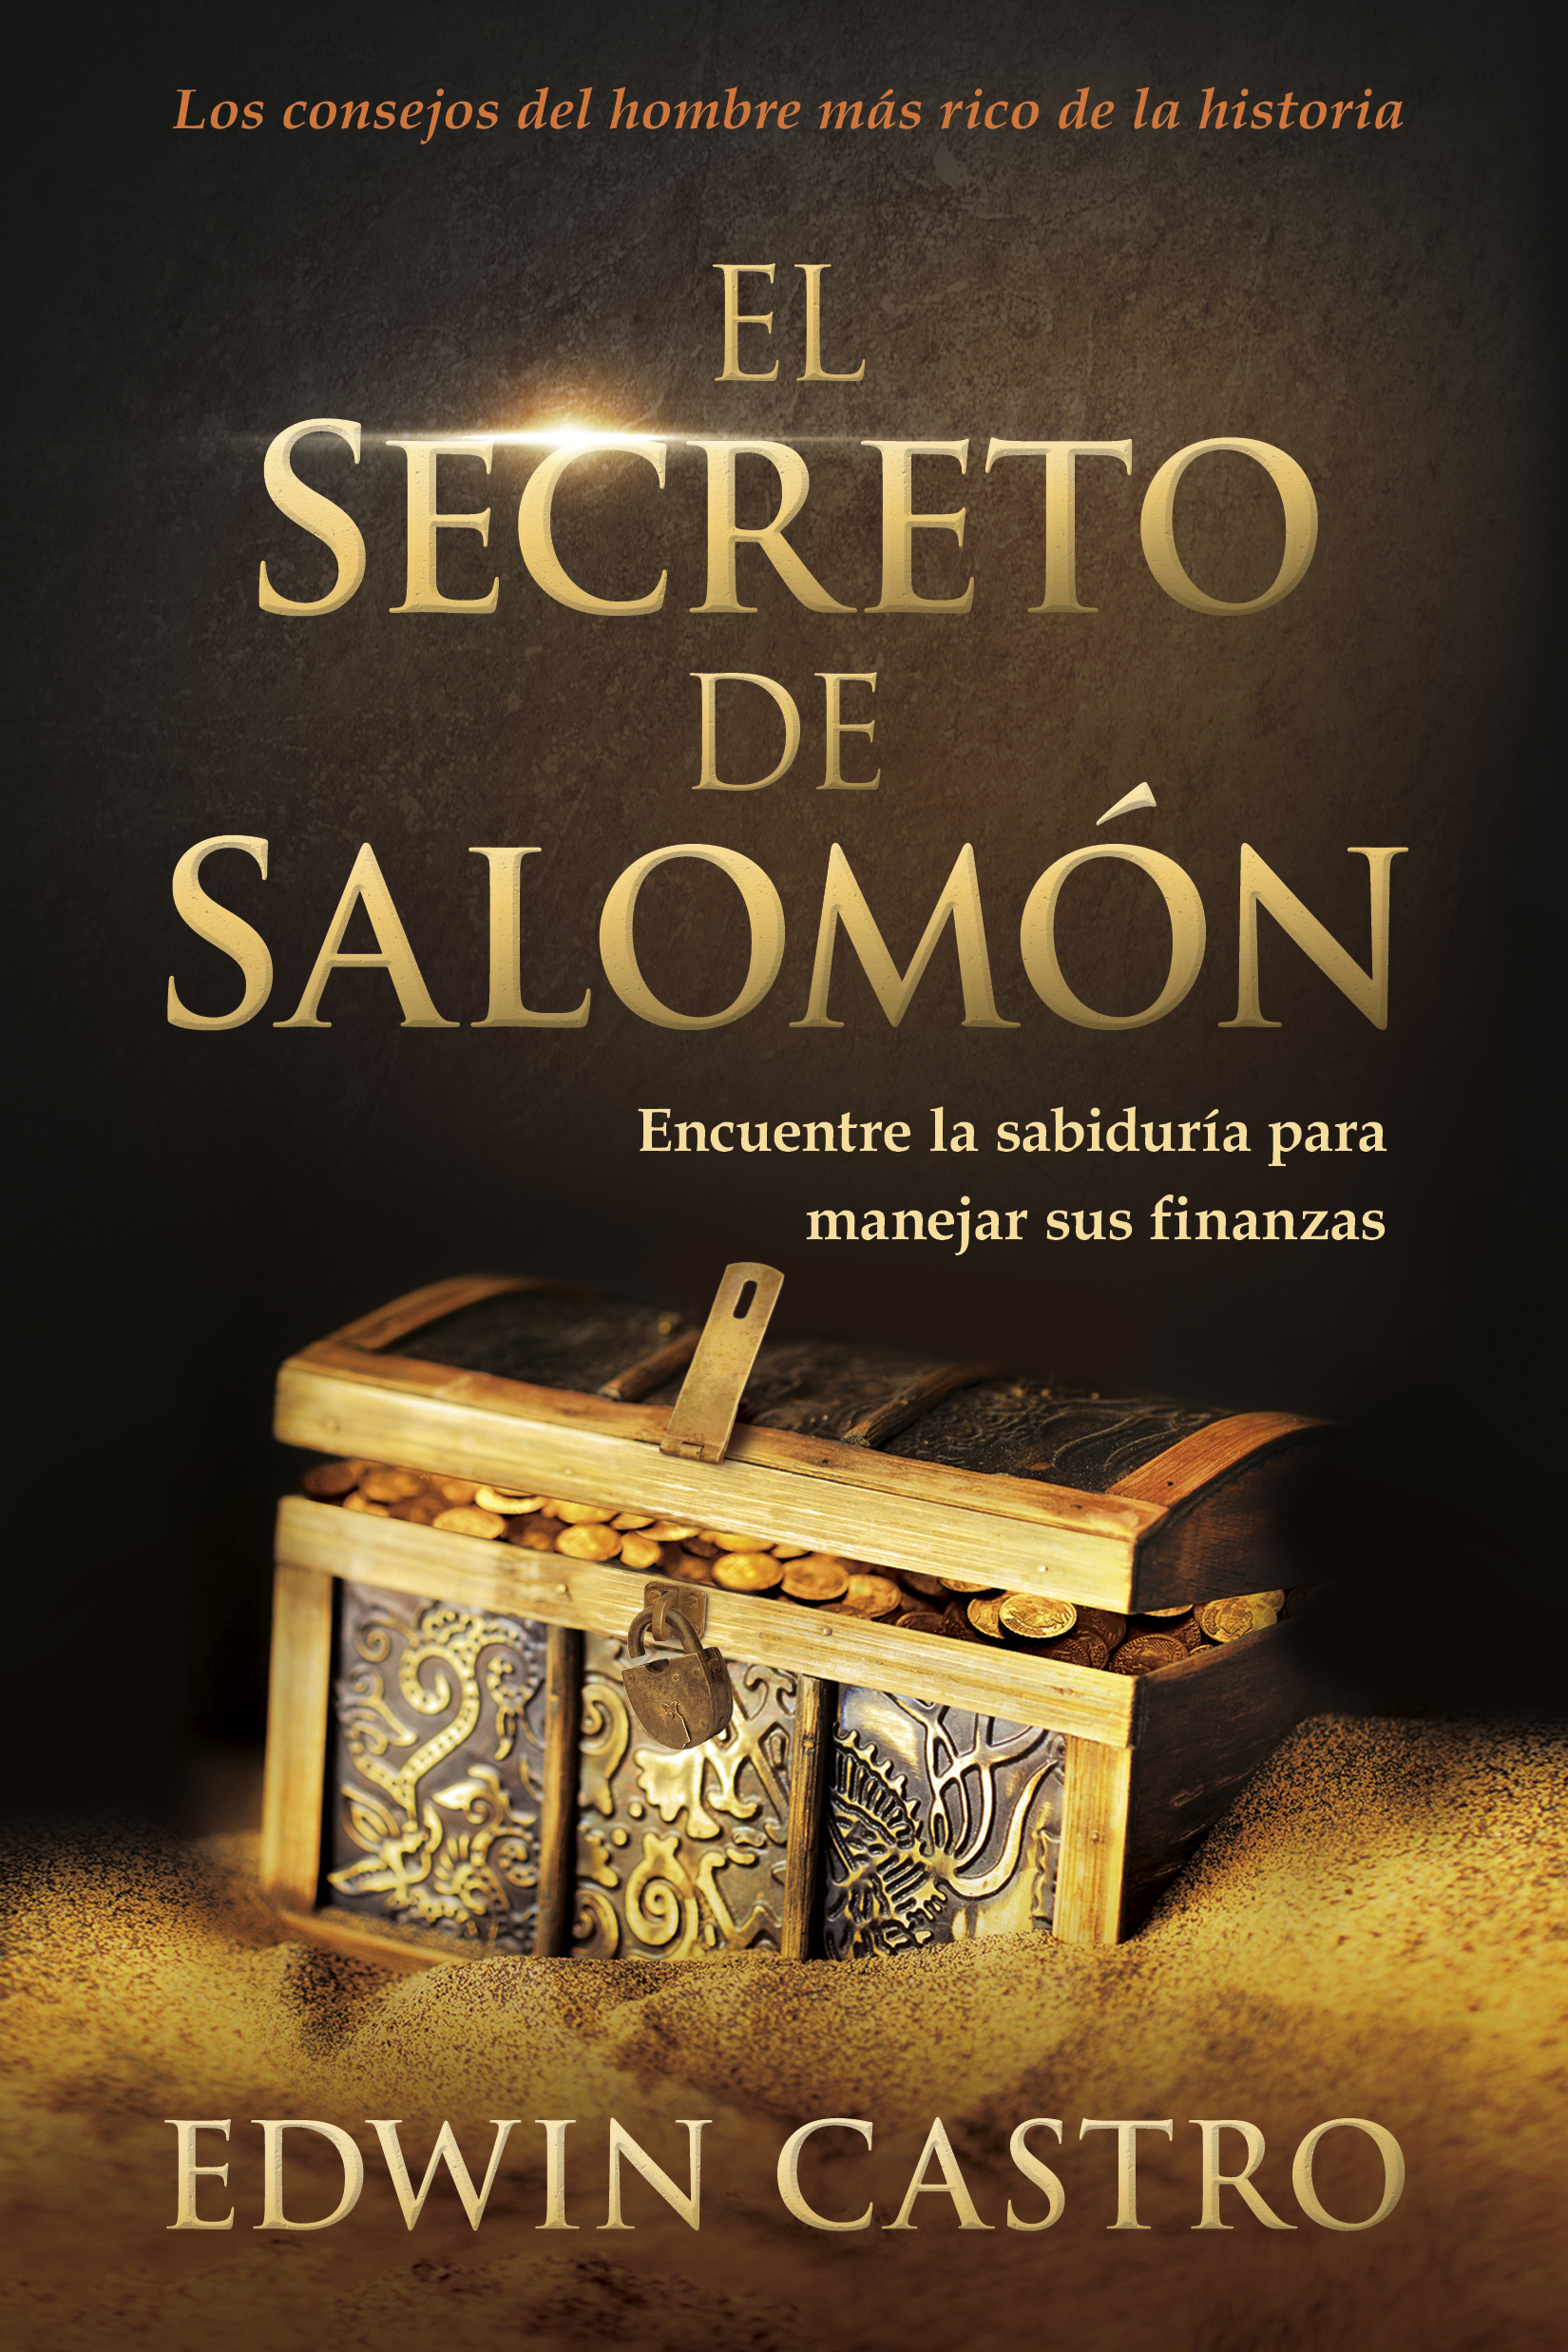 El_secreto_de_Salomón_FRONT